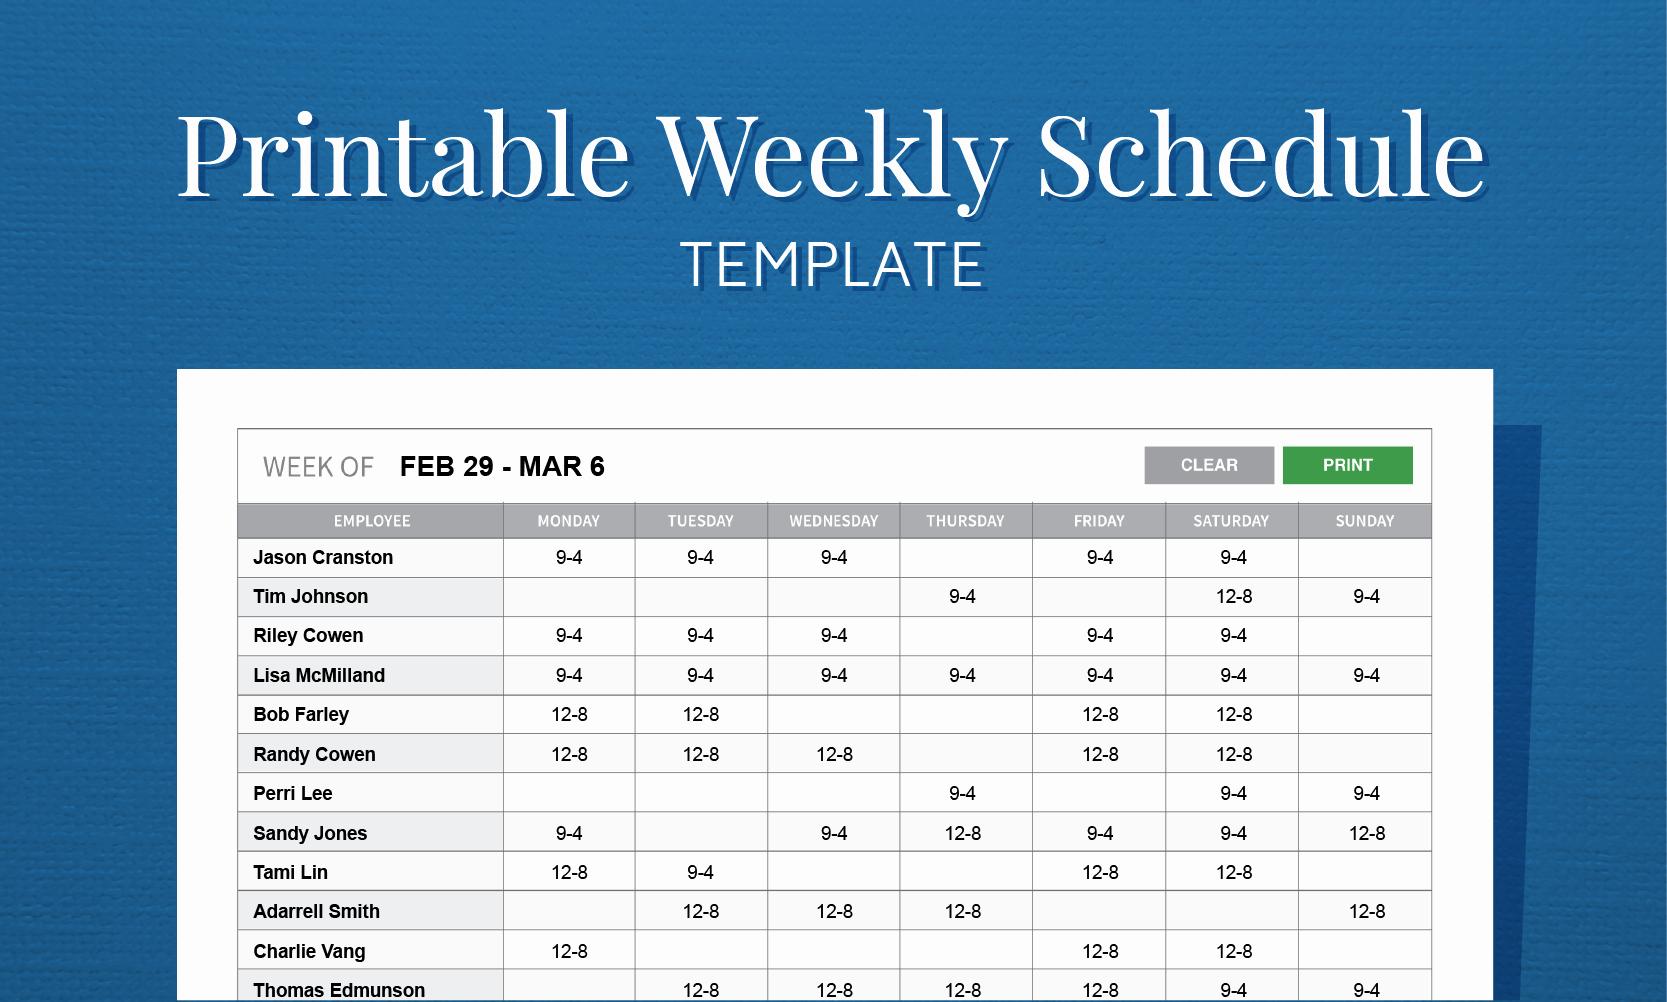 Free Employee Work Schedule Template Unique Free Printable Work Schedule Template for Employee